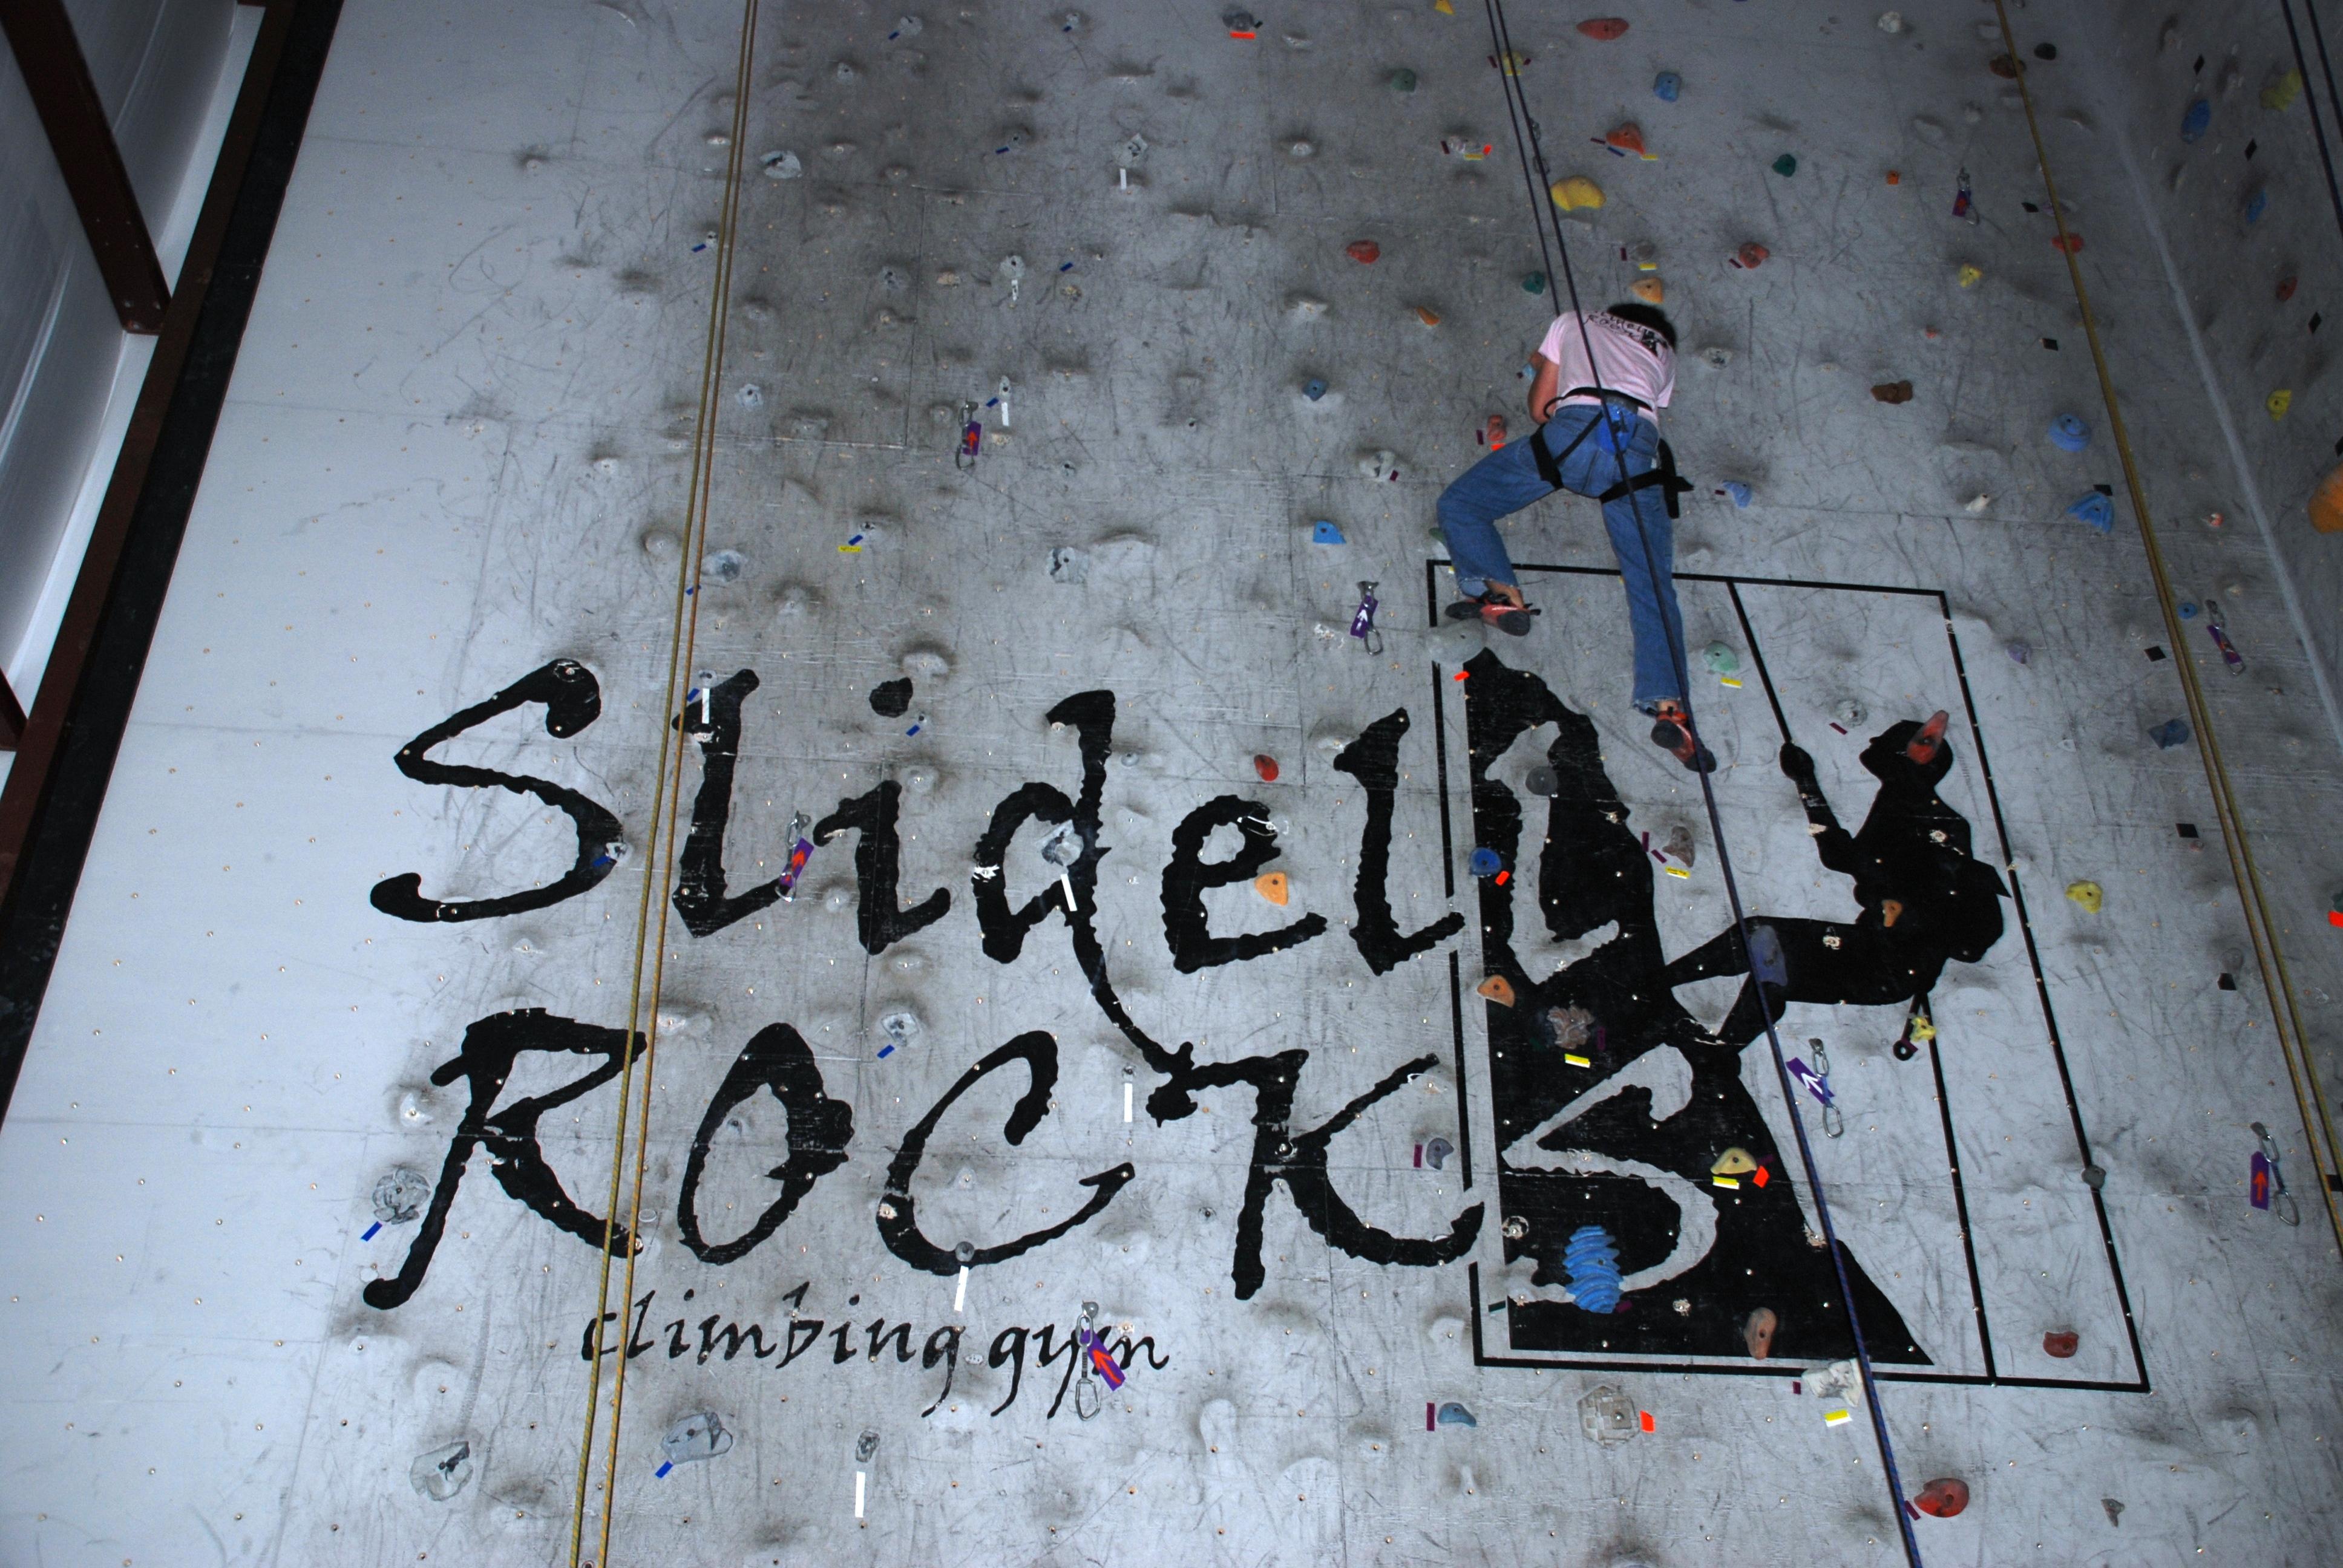 Rock climbing slidell